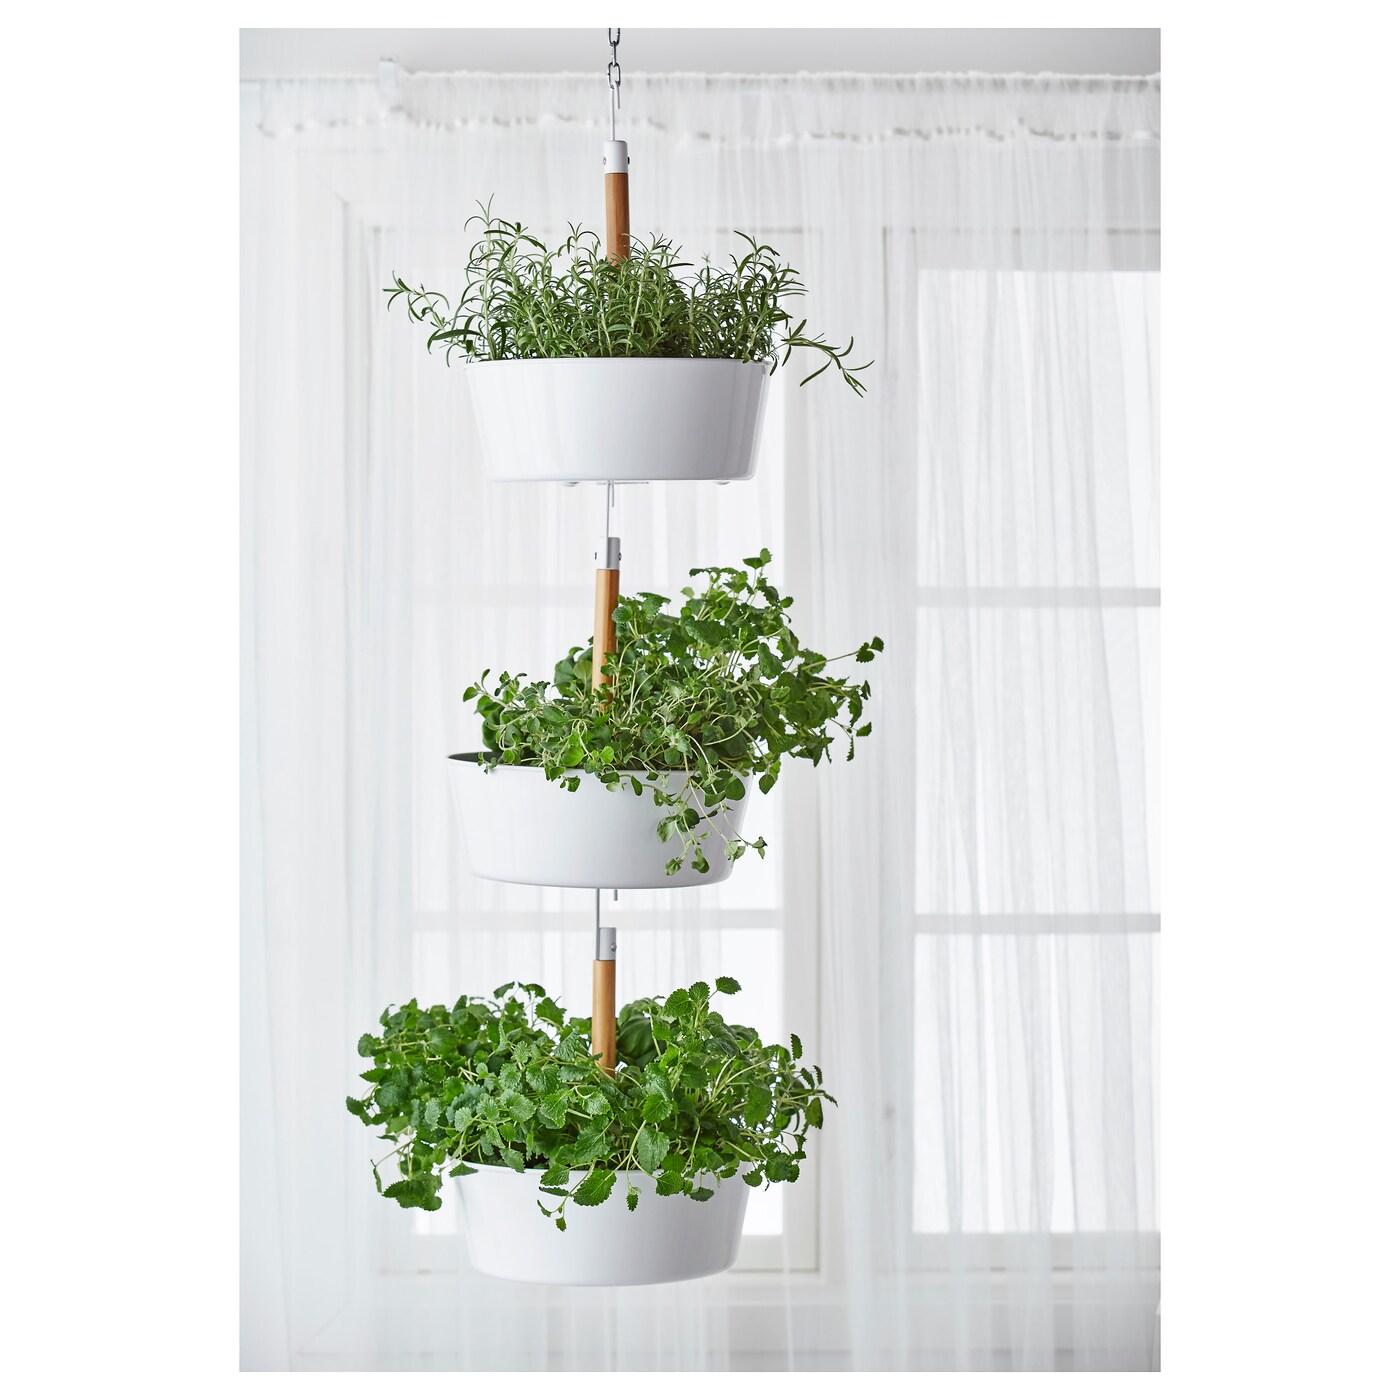 Jardinière À Suspendre Ikea bittergurka jardinière à suspendre - blanc